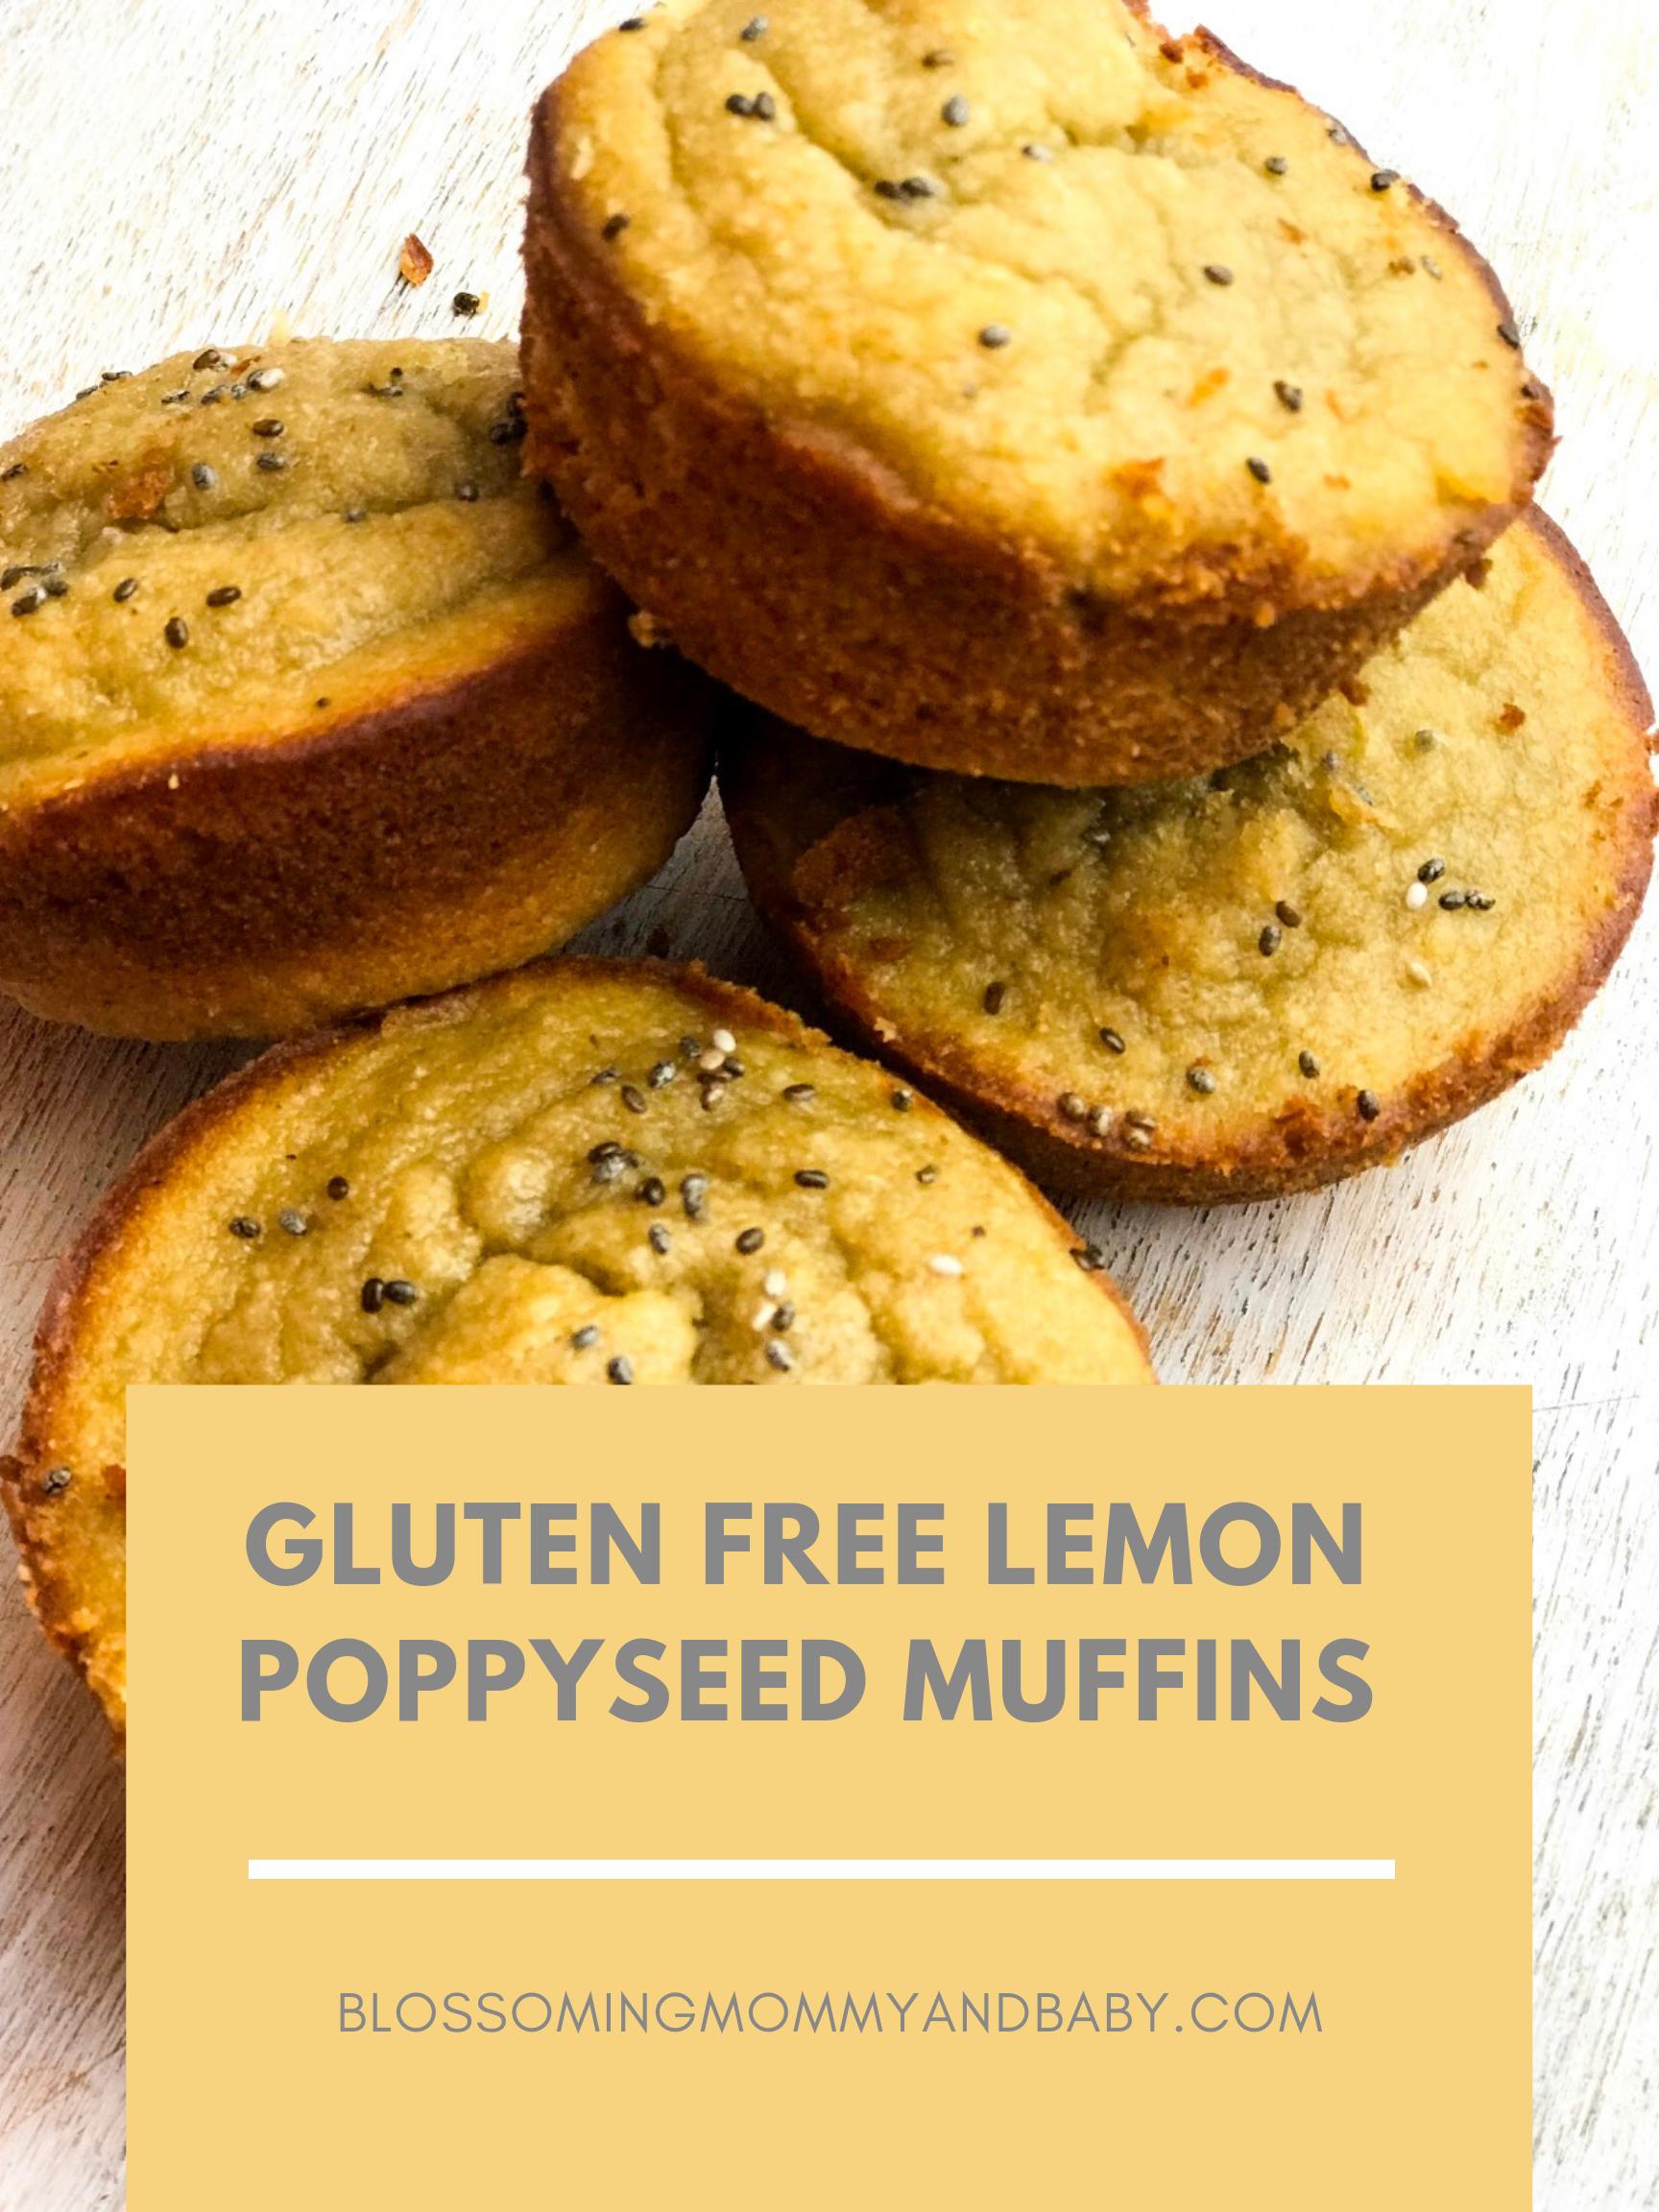 Gluten Free Lemon Poppyseed Muffins